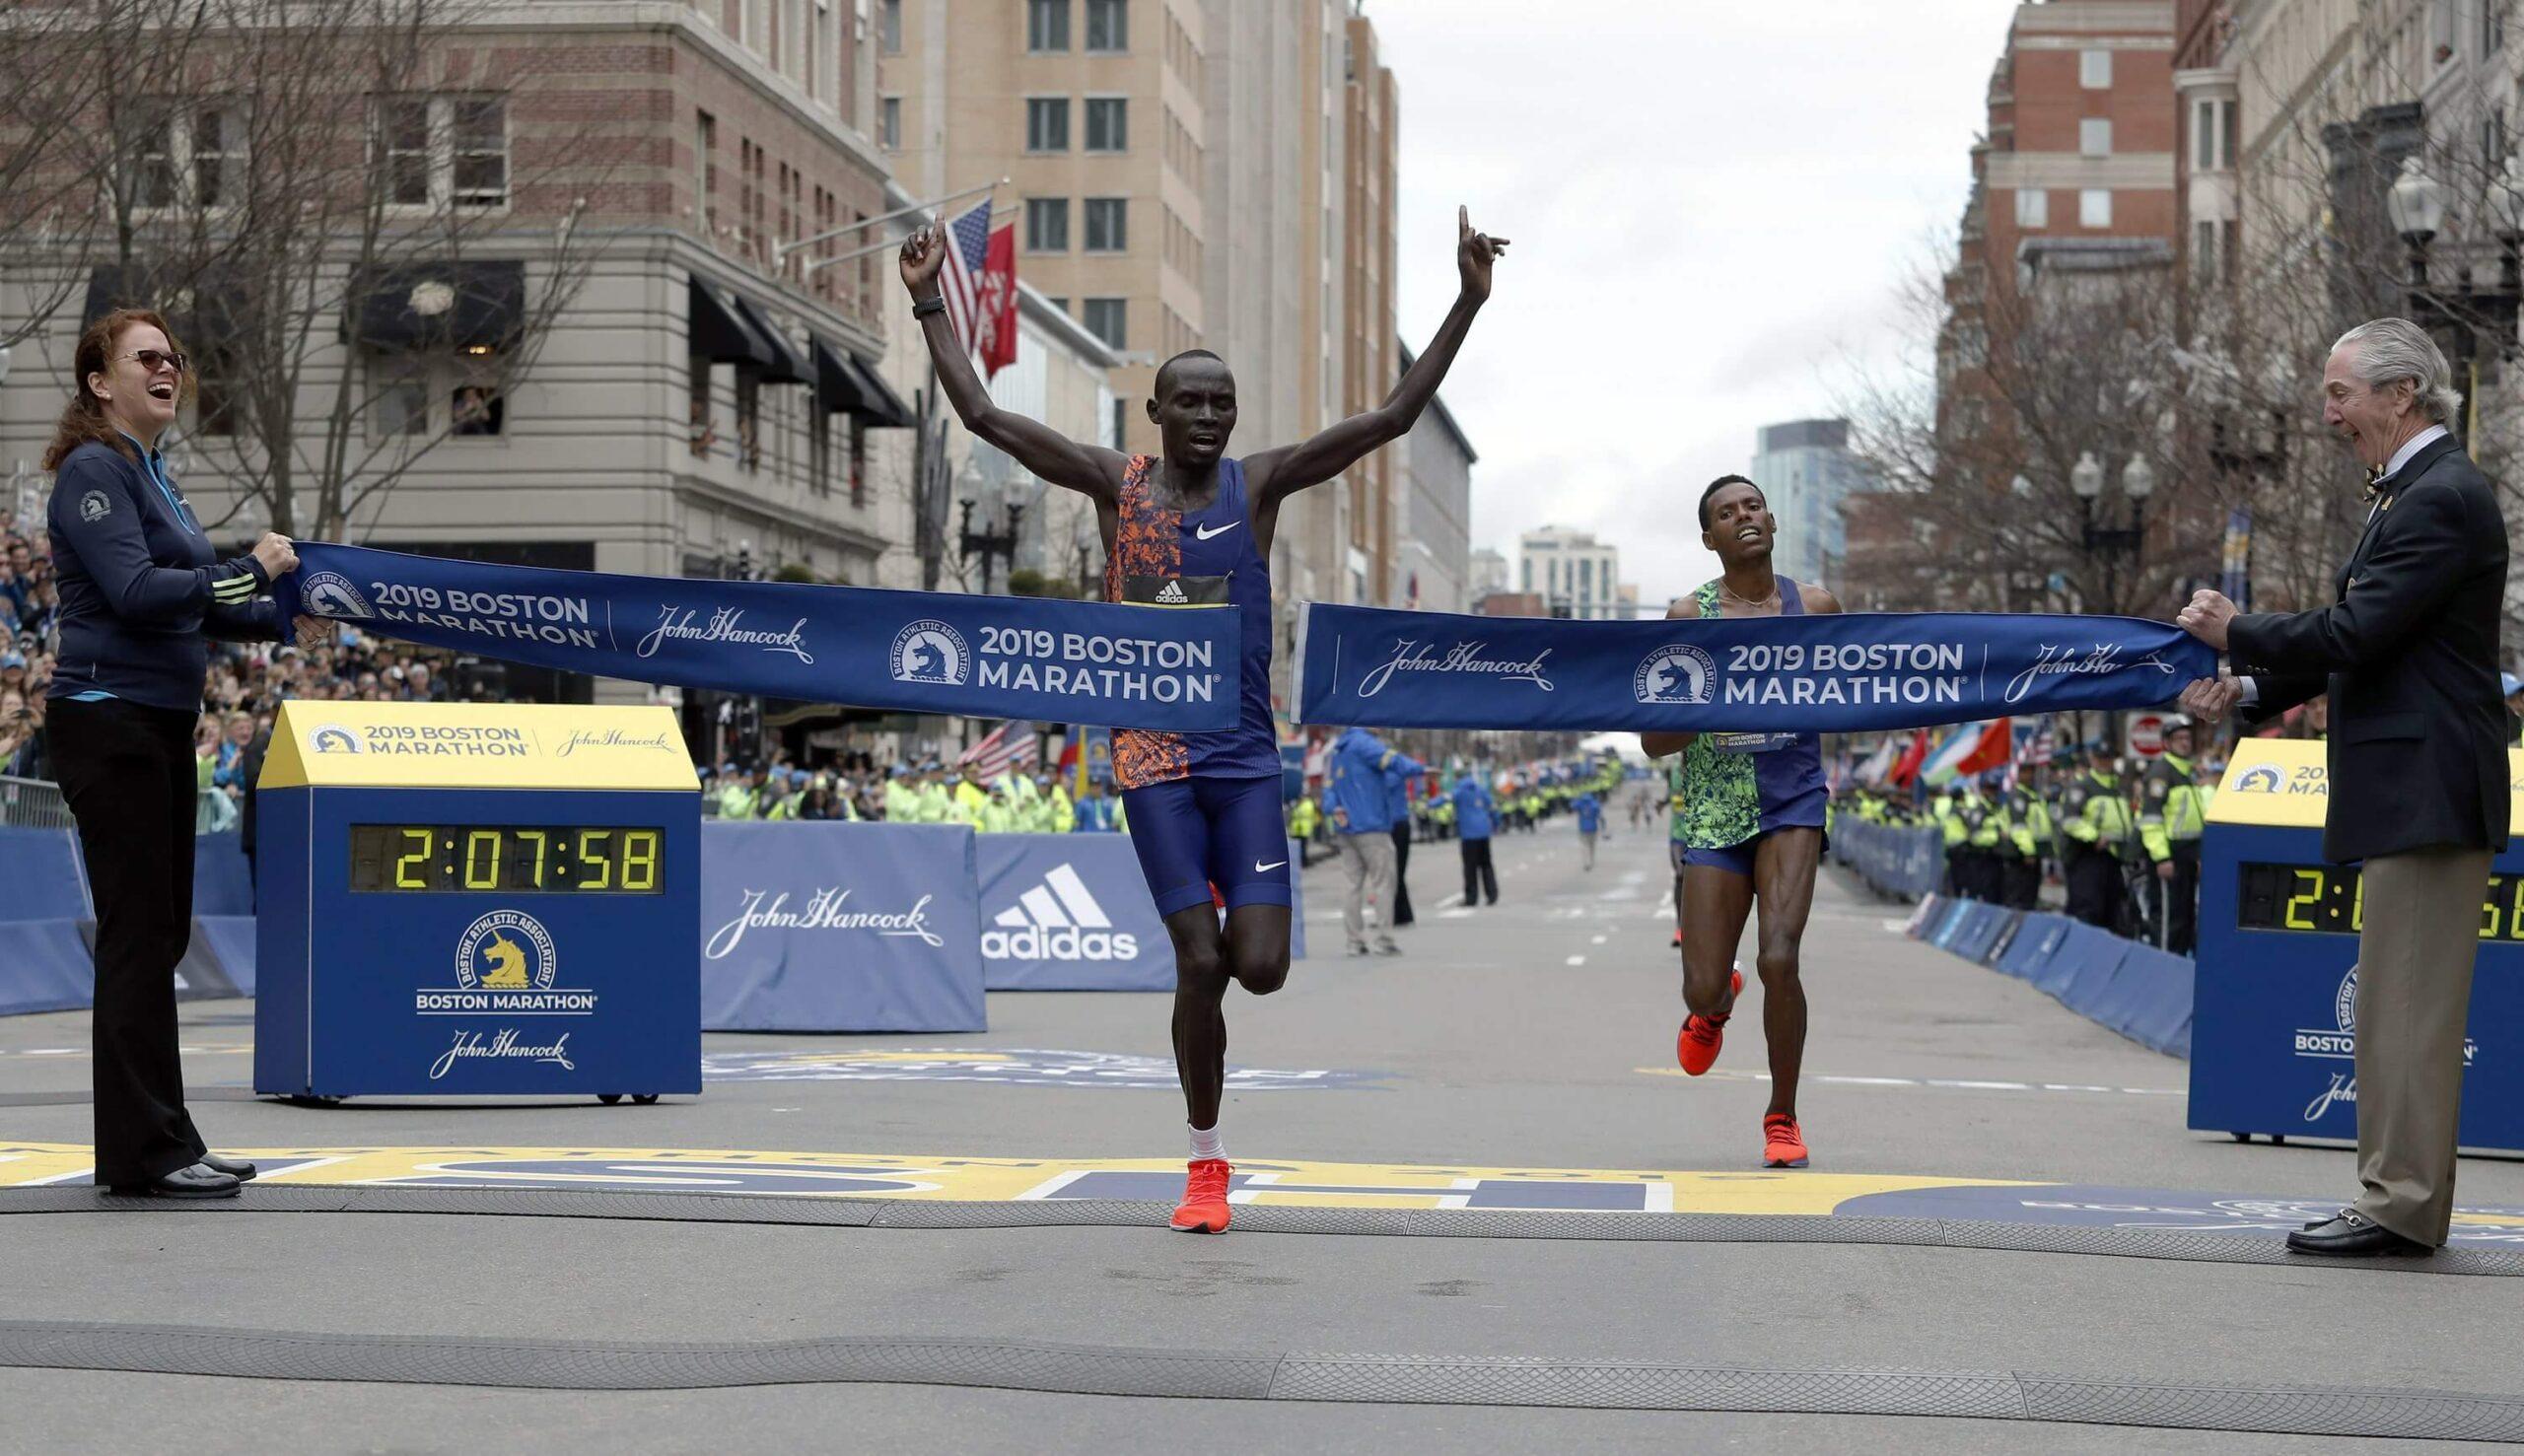 Boston Marathon Wiki 2021 (October) Know The Complete Details!